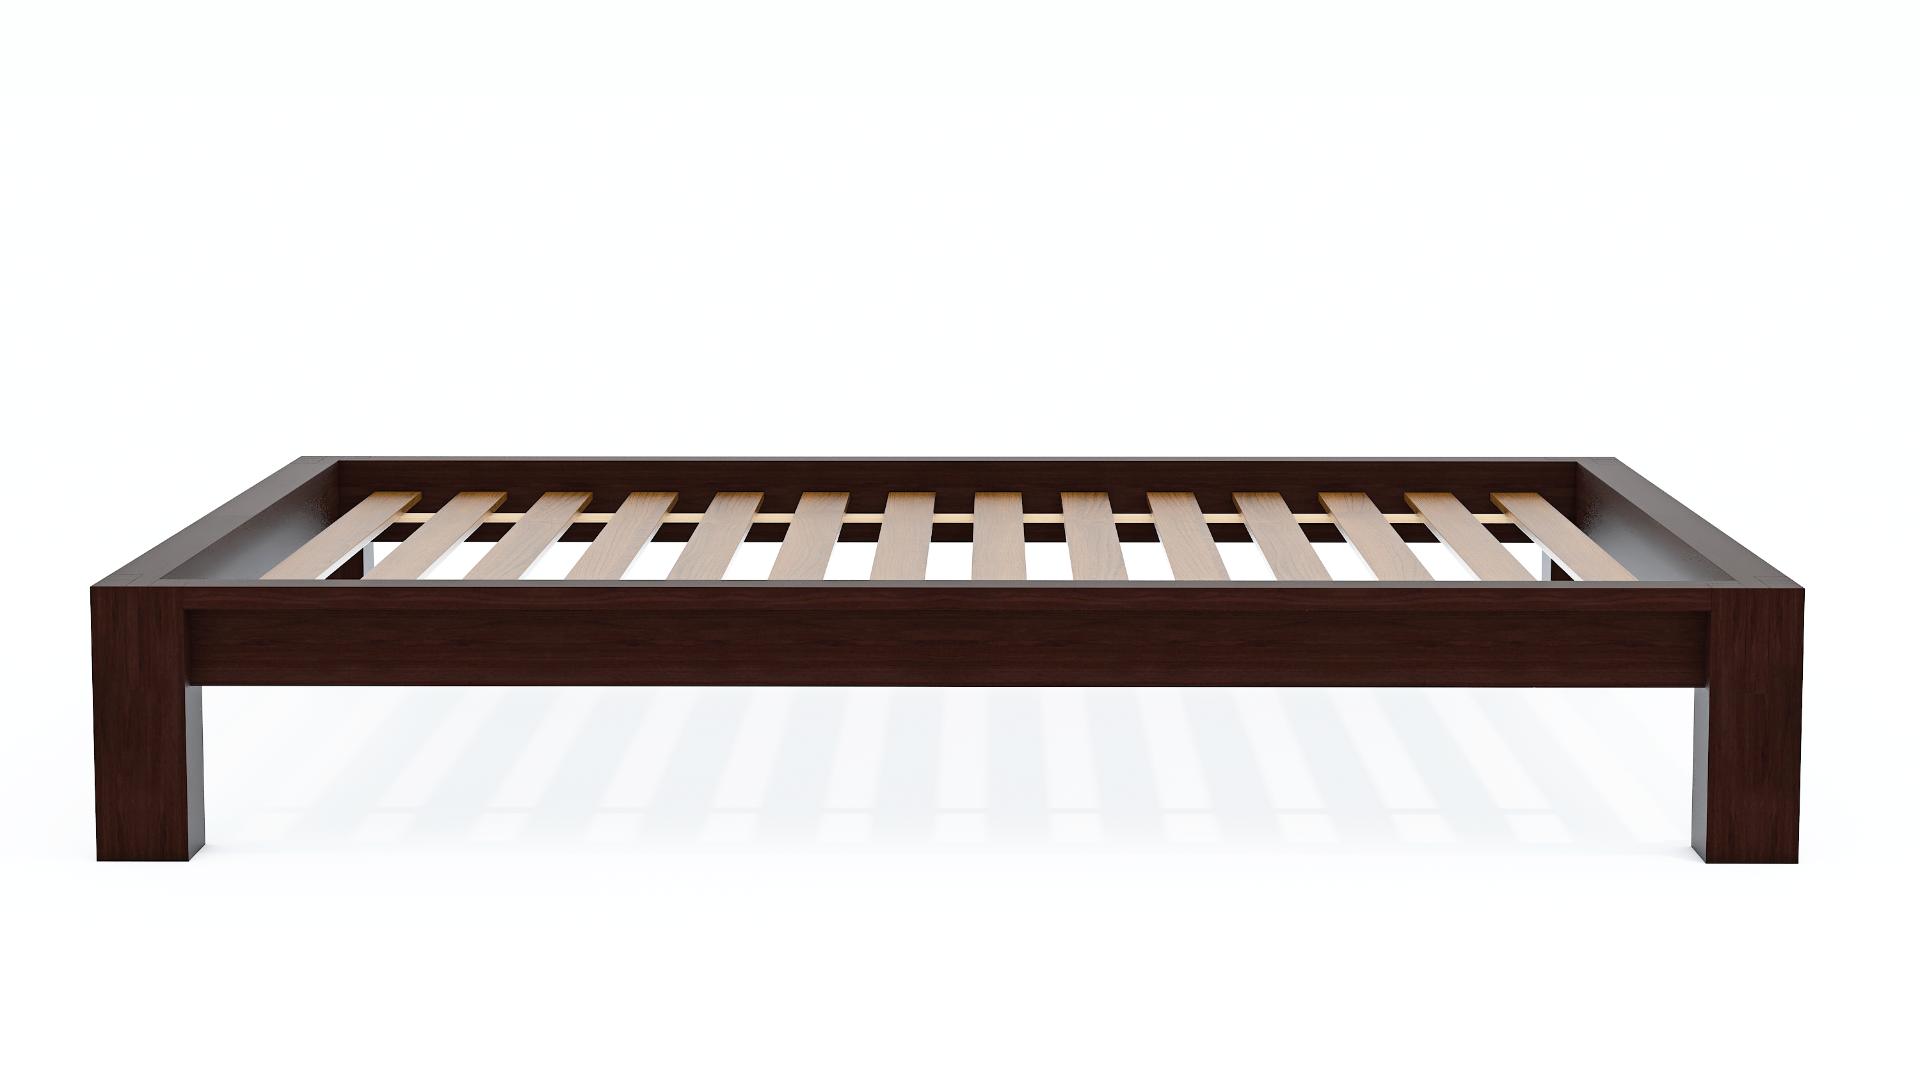 Raku Tatami High Rise Platform Bed in Dark Walnut